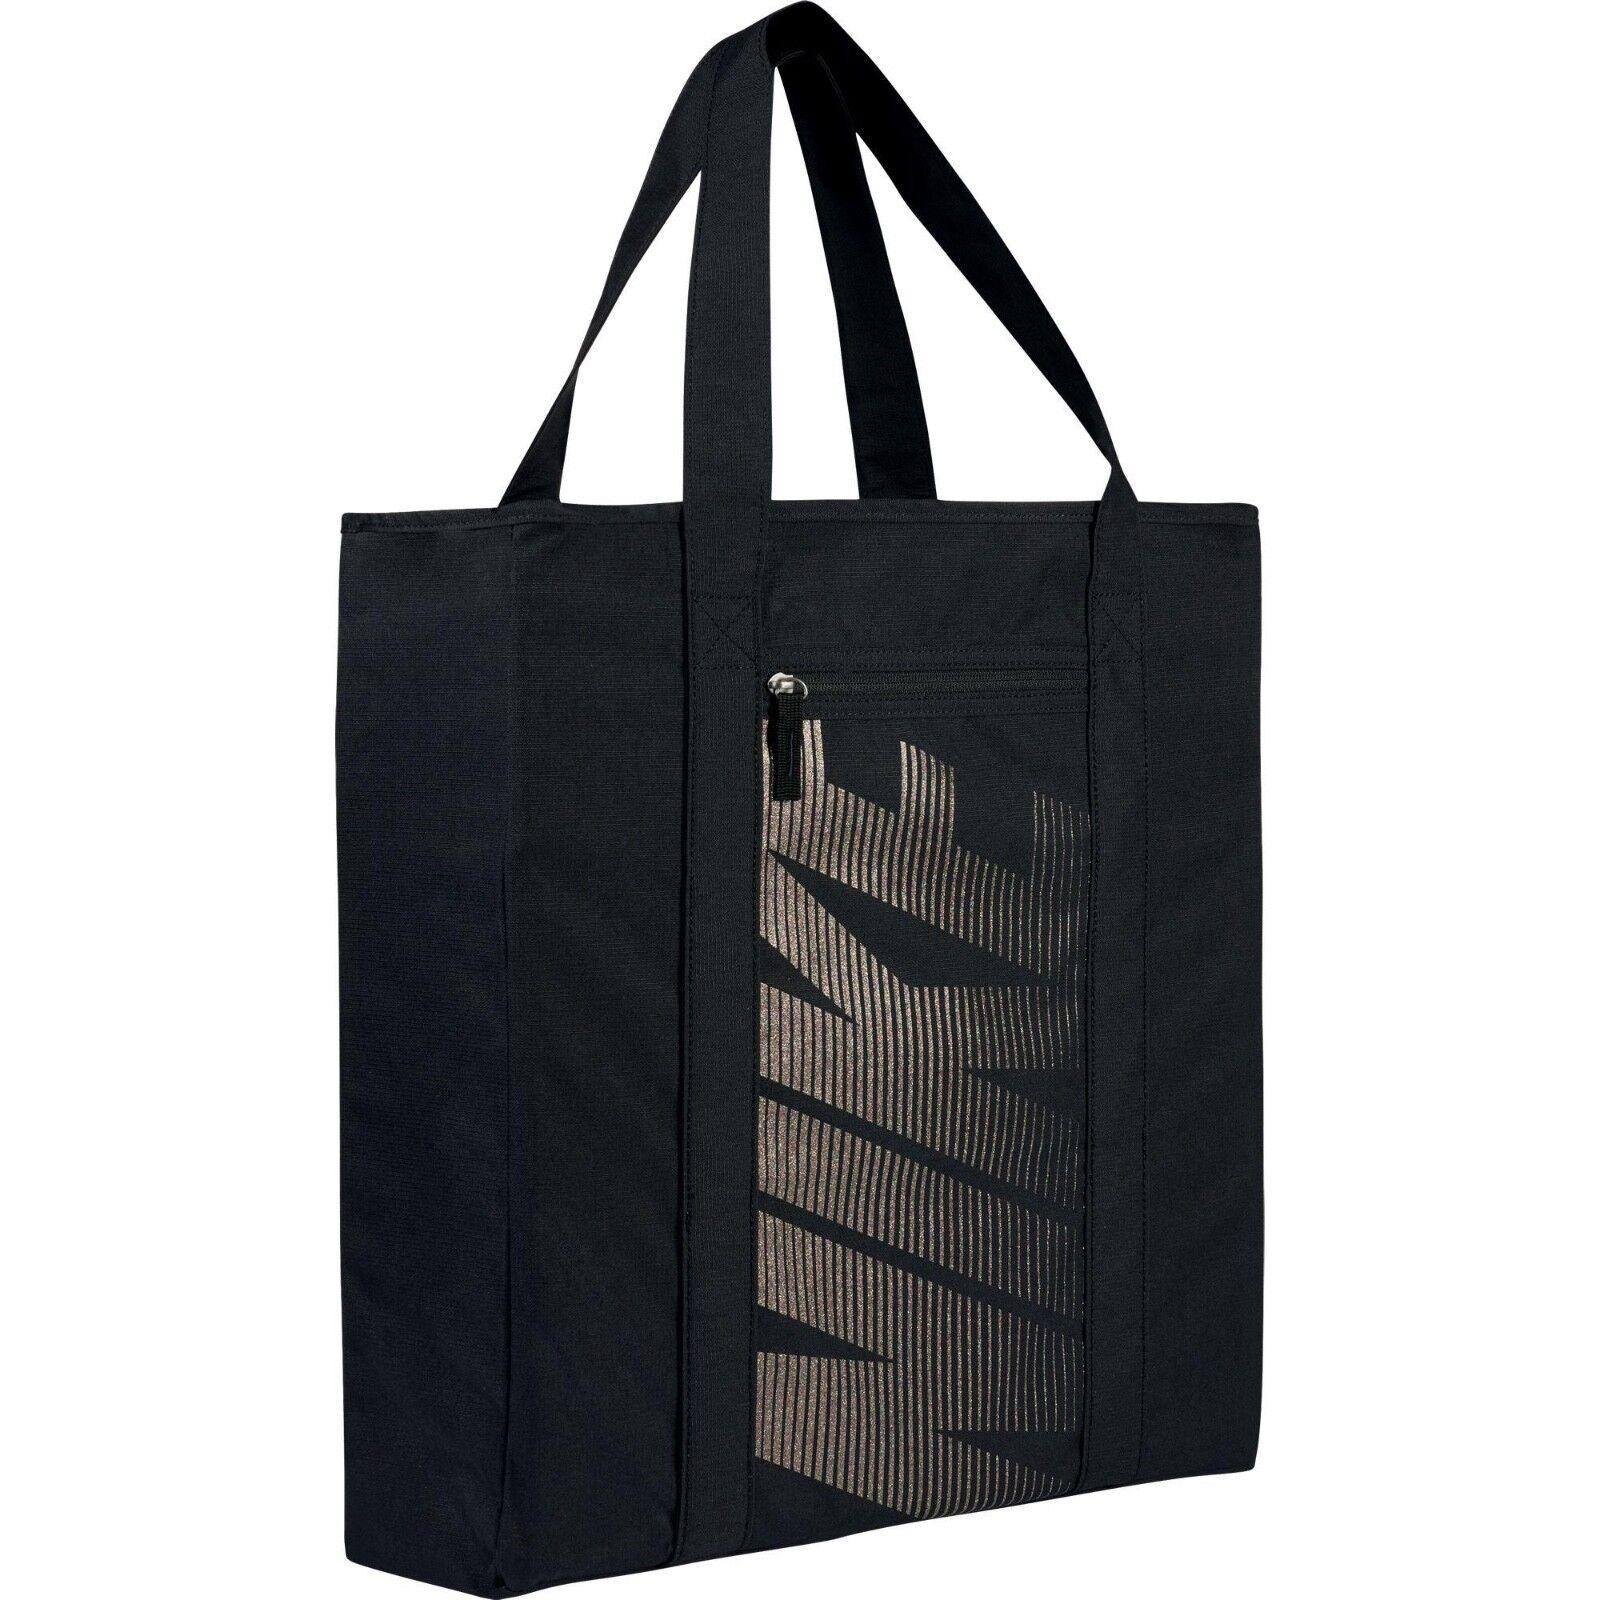 Nike Women's Gym Training Tote Bag One Size Black Glitter Gy